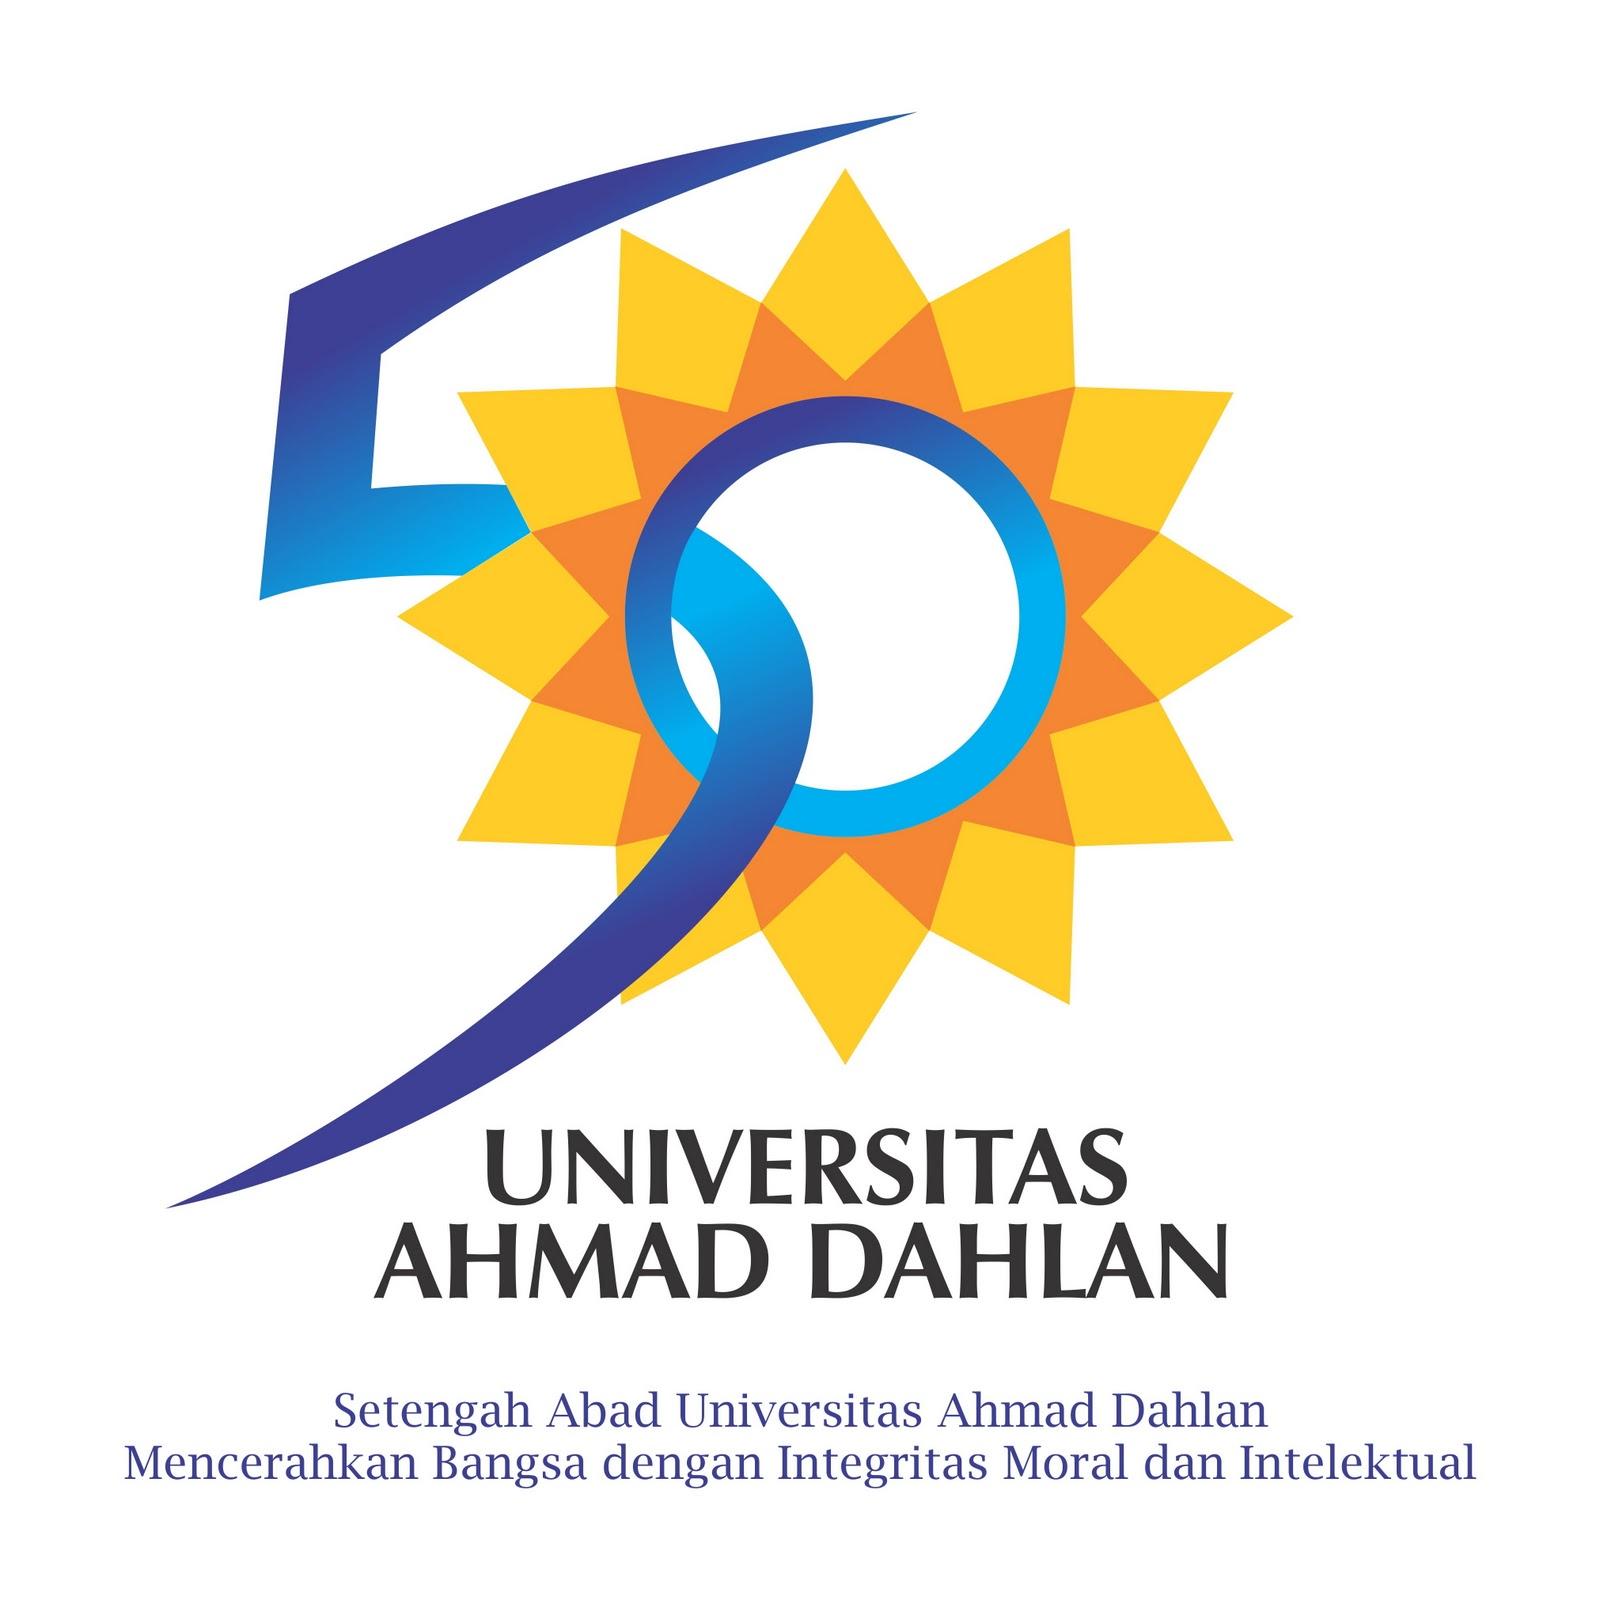 fakultas dahlan indonesia dahlan himne ahmad keluarga look stronger